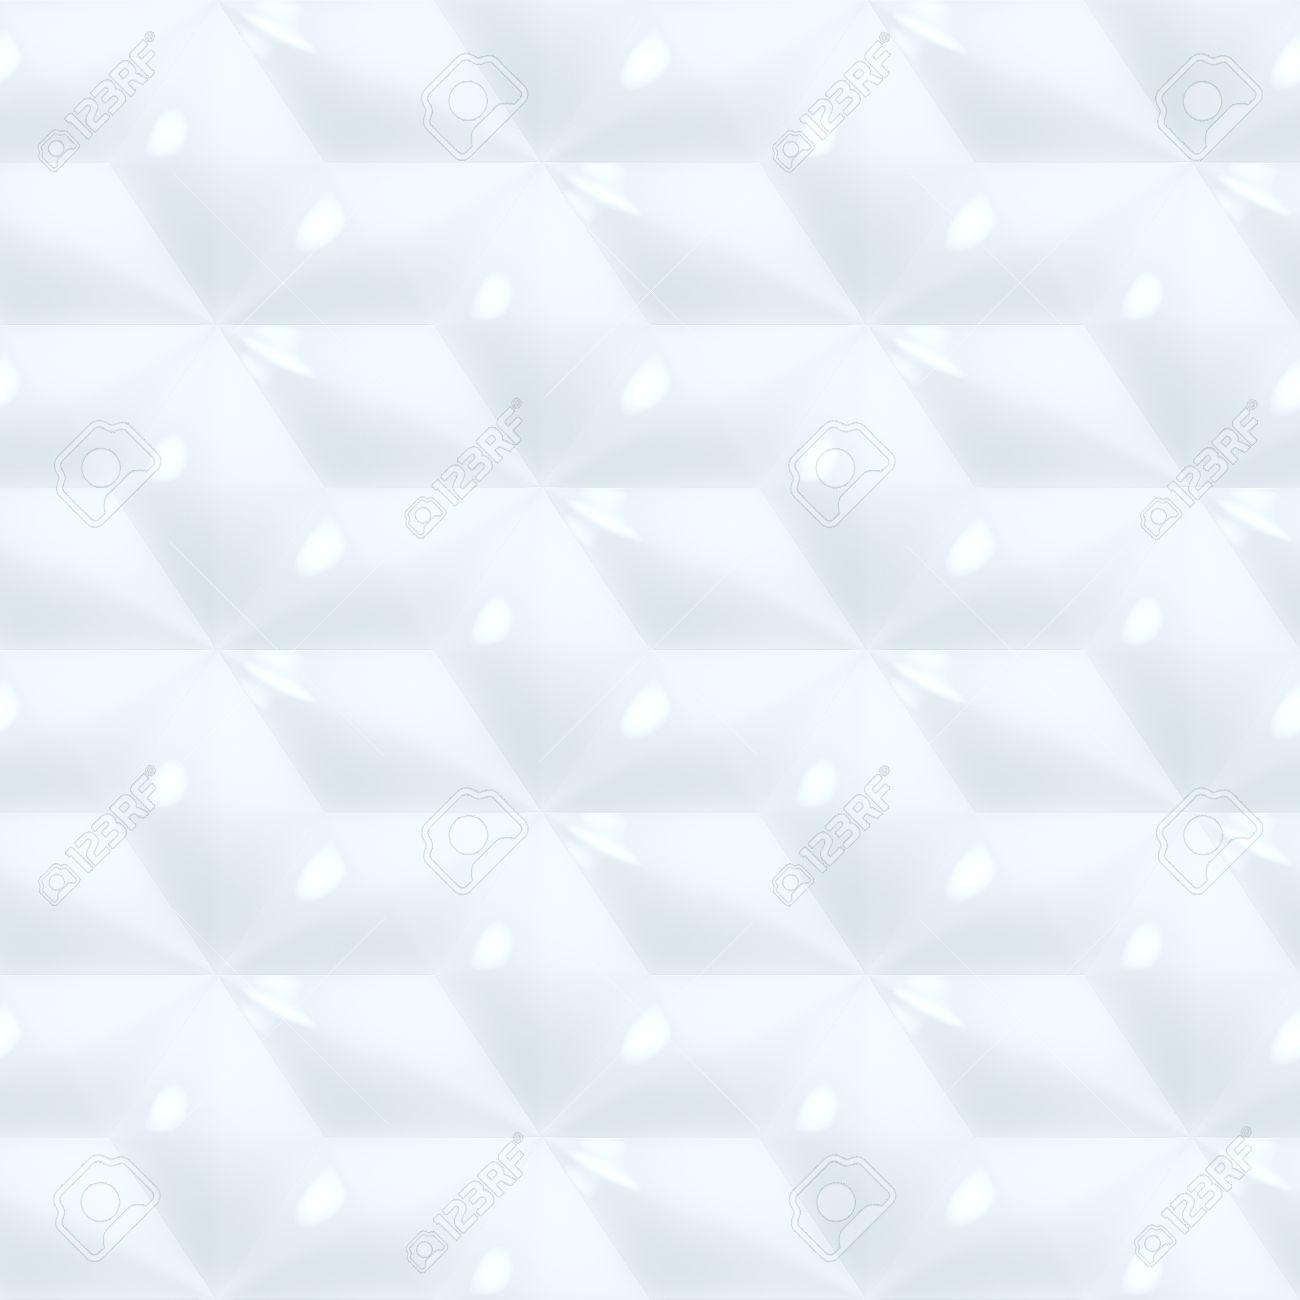 Plastic Texture Seamless